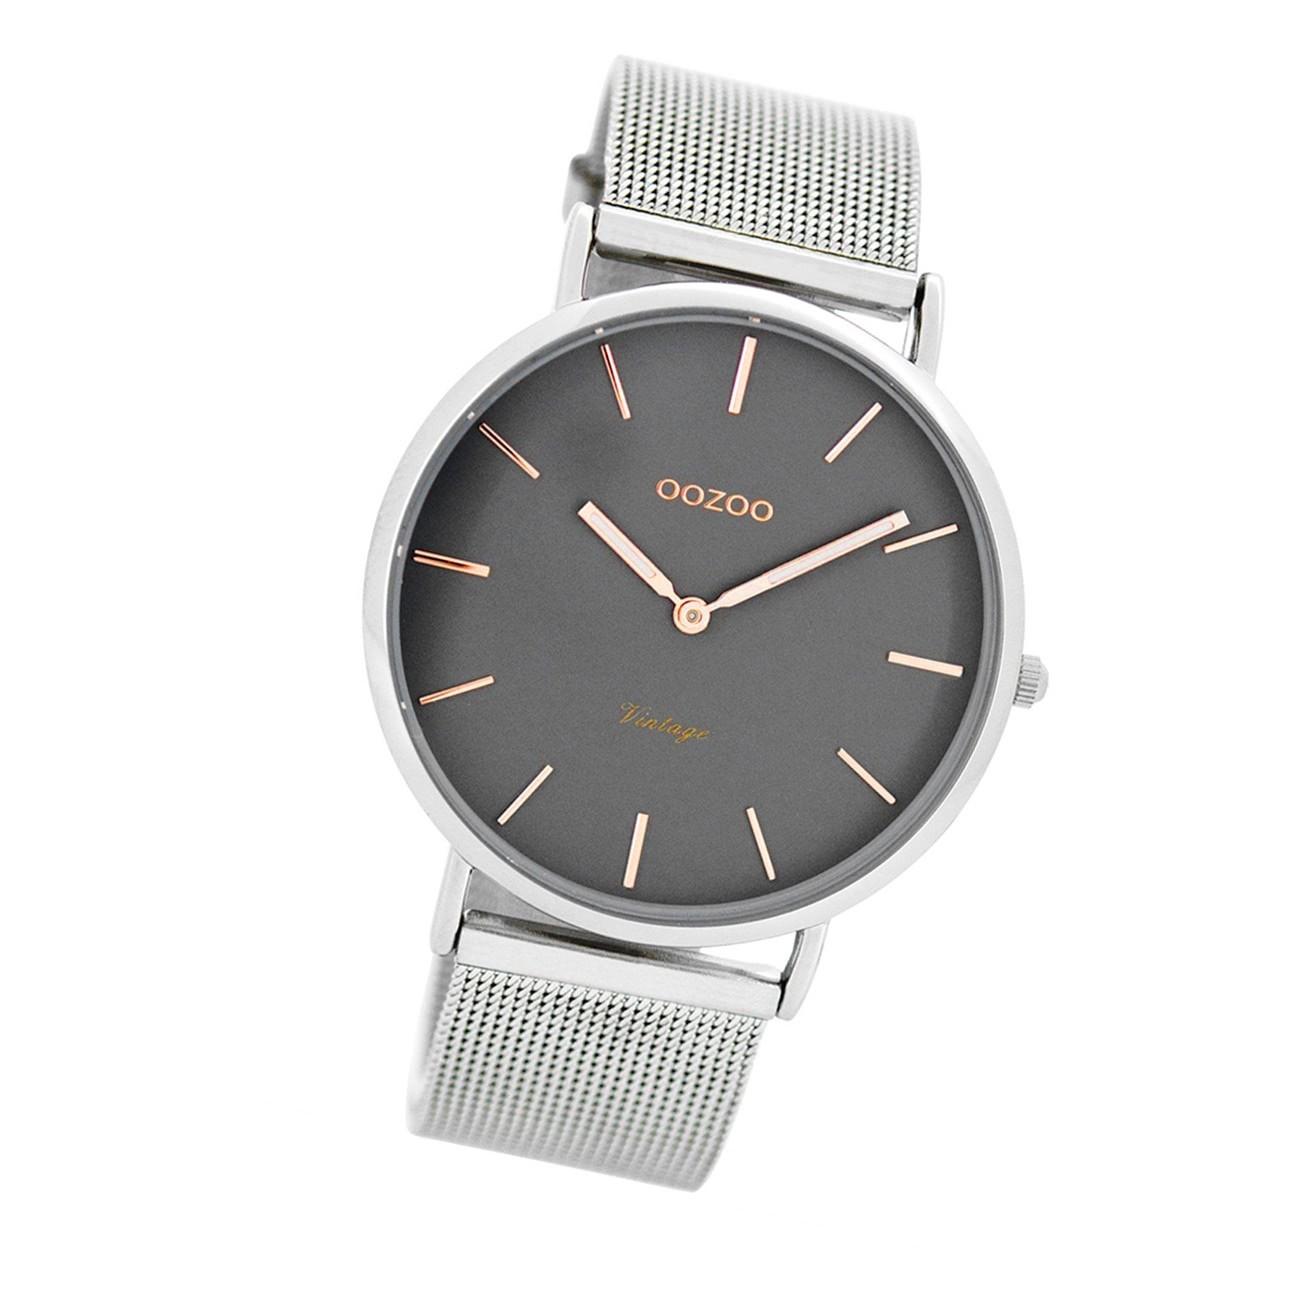 Oozoo Damen Herren-Uhr Ultra Slim Quarzuhr Metall-Armband silber UOC7725